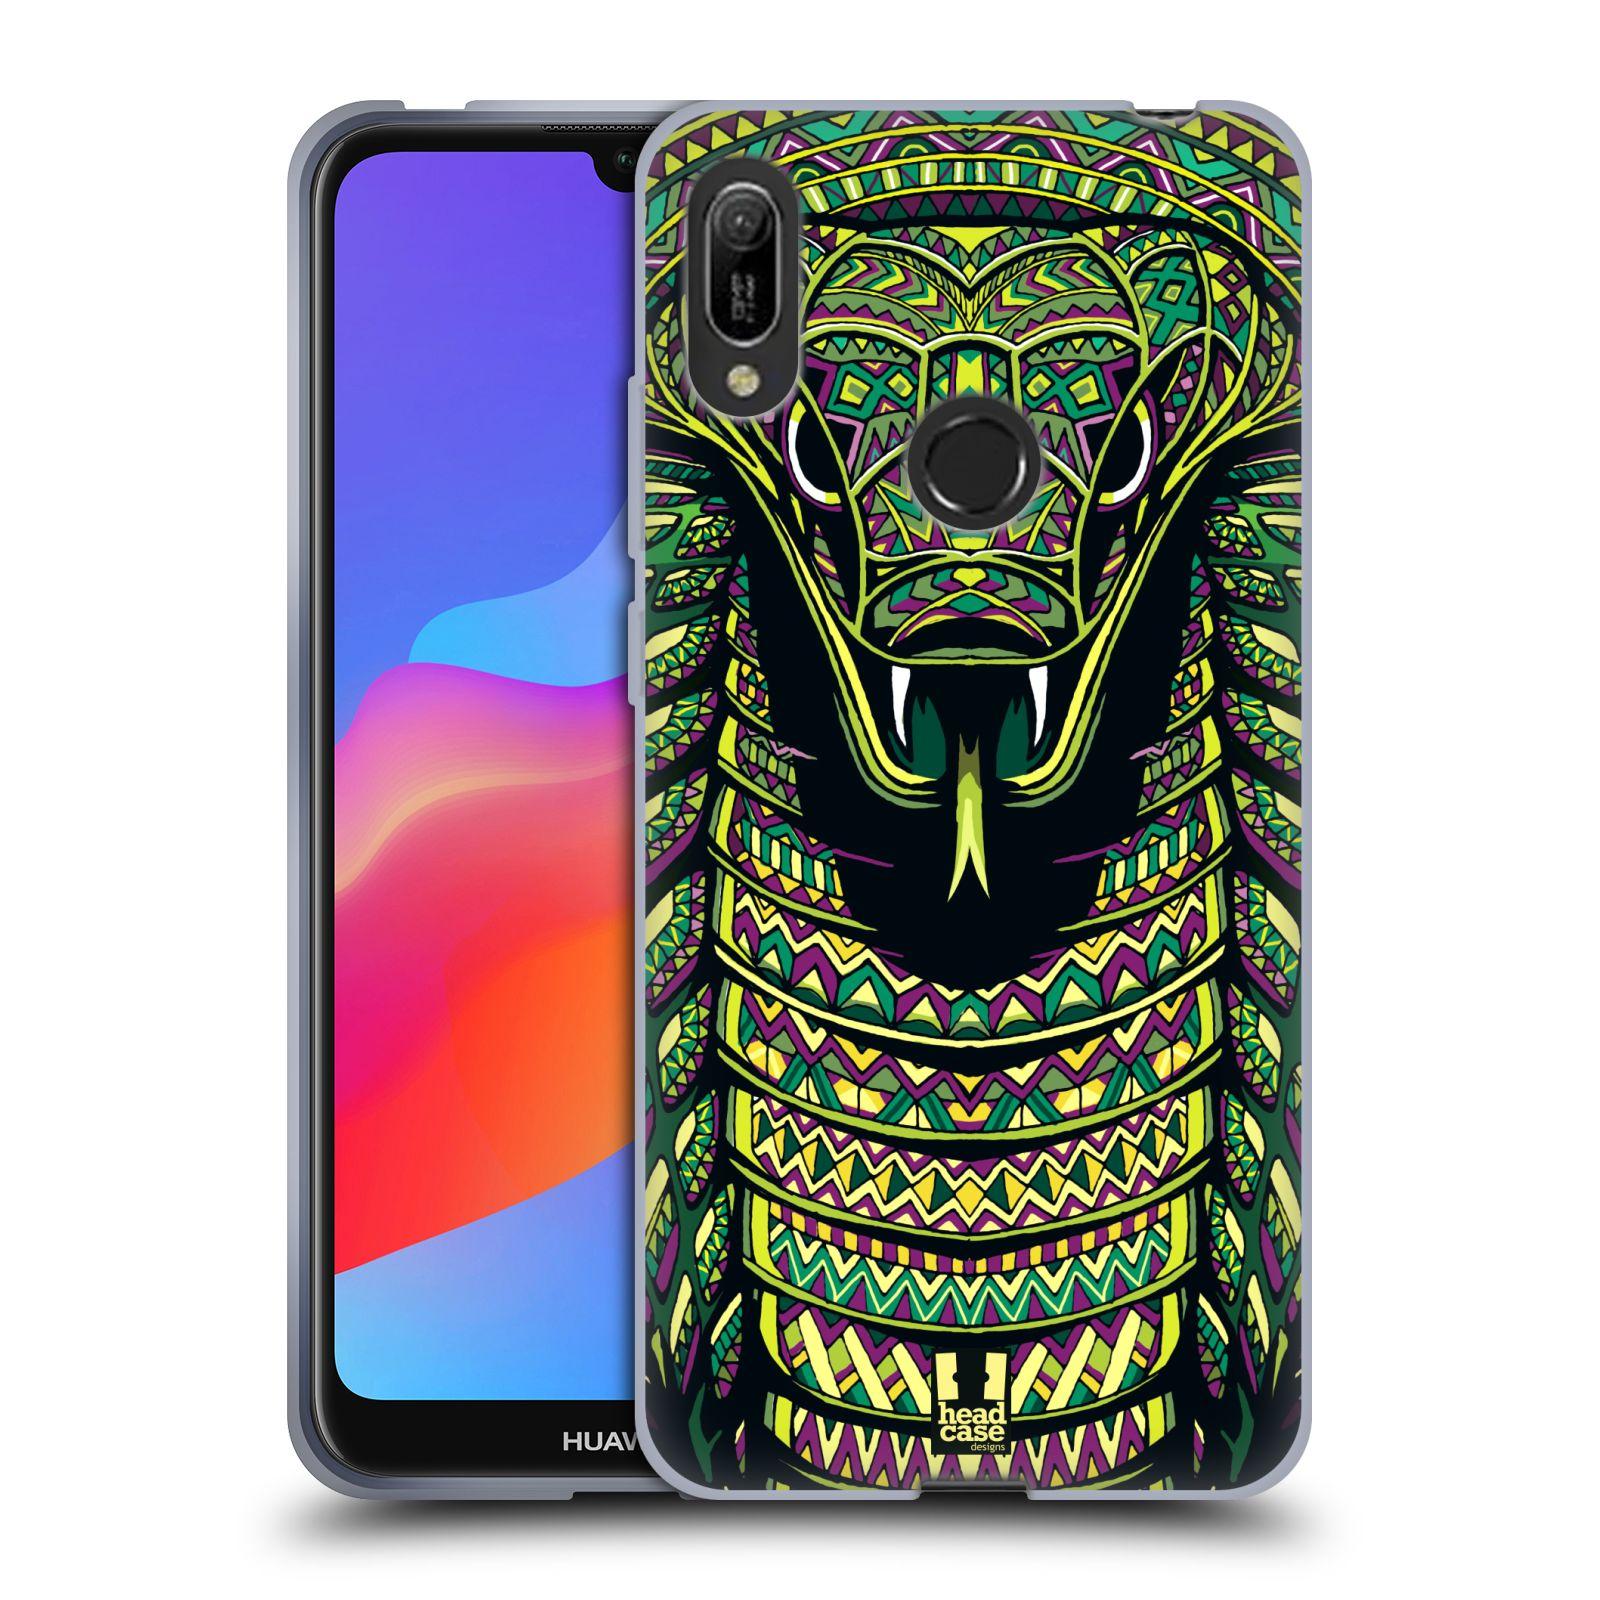 Silikonové pouzdro na mobil Huawei Y6 (2019) - Head Case - AZTEC HAD